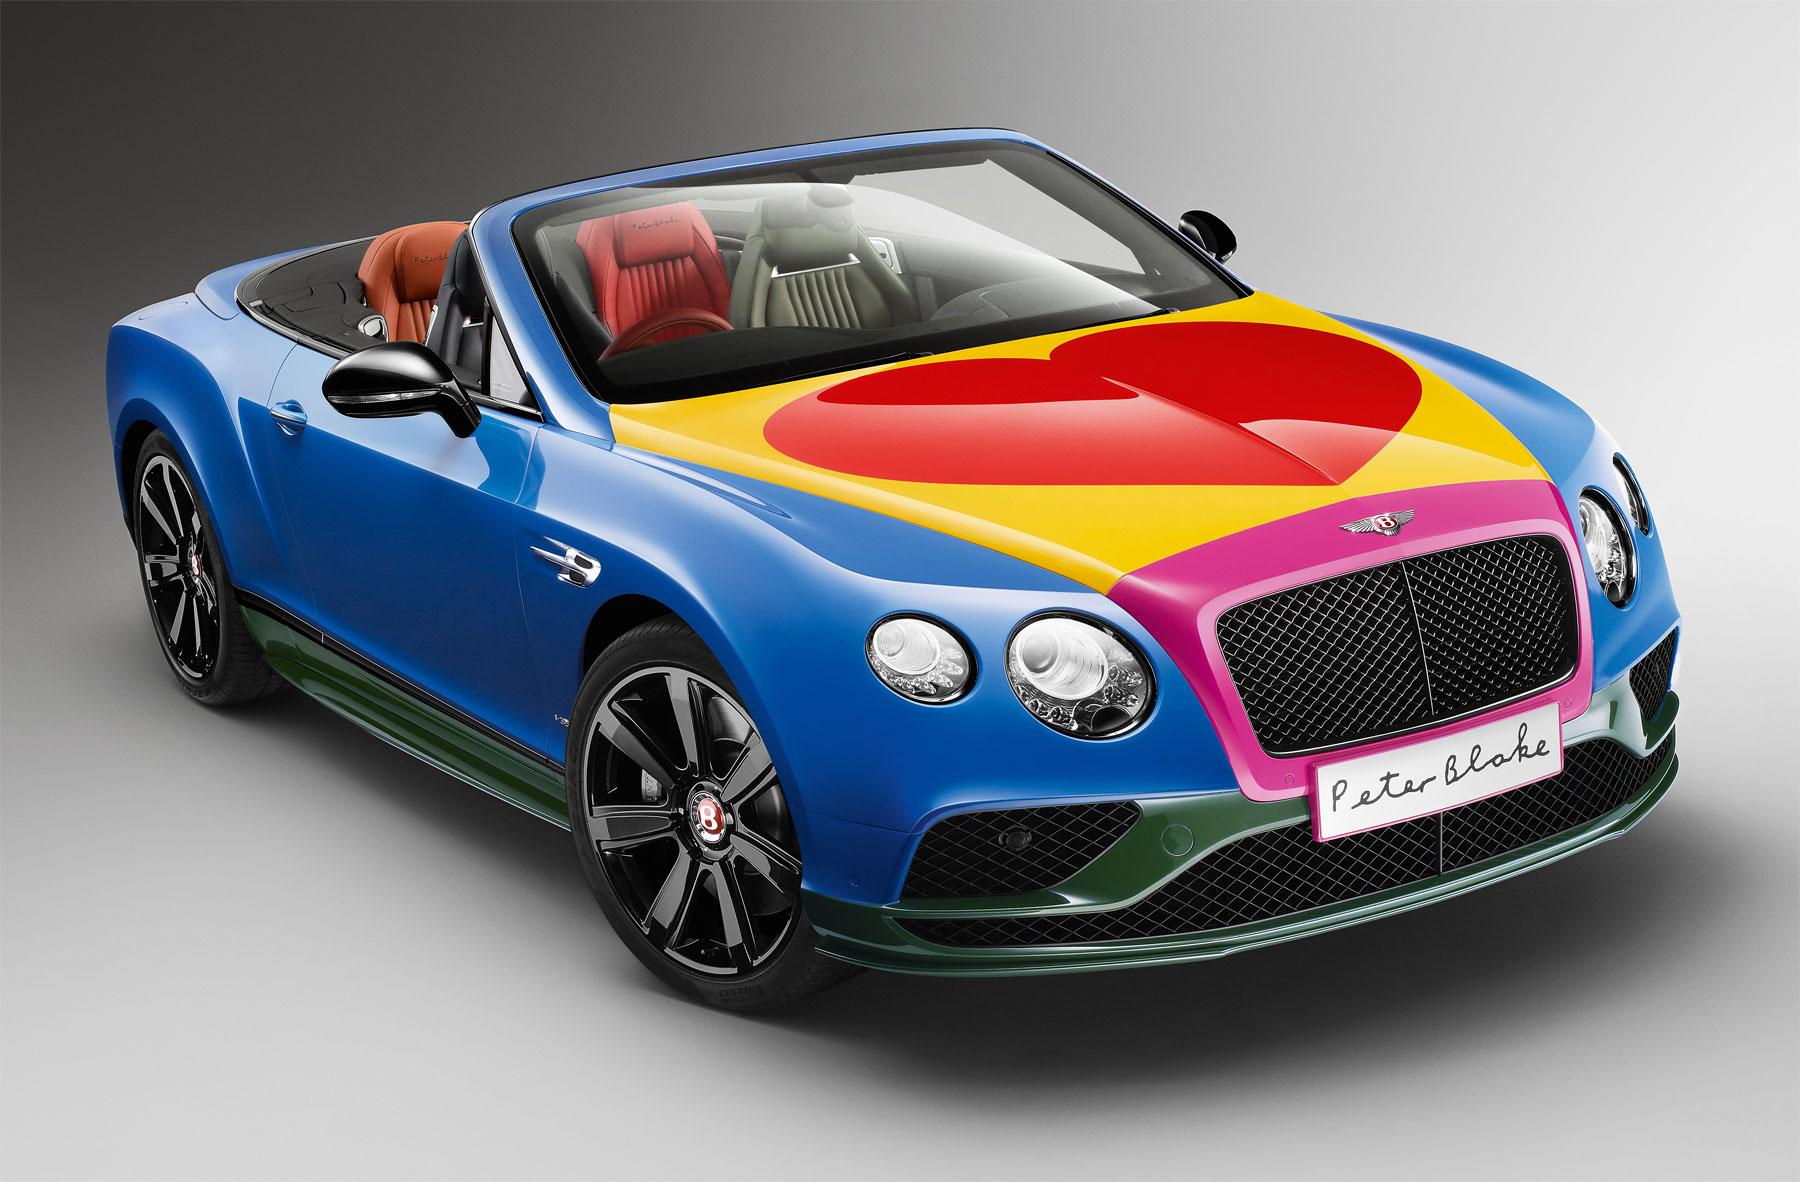 Bentley unveils new Pop Art Bentley V8 by artist Sir Peter Blake